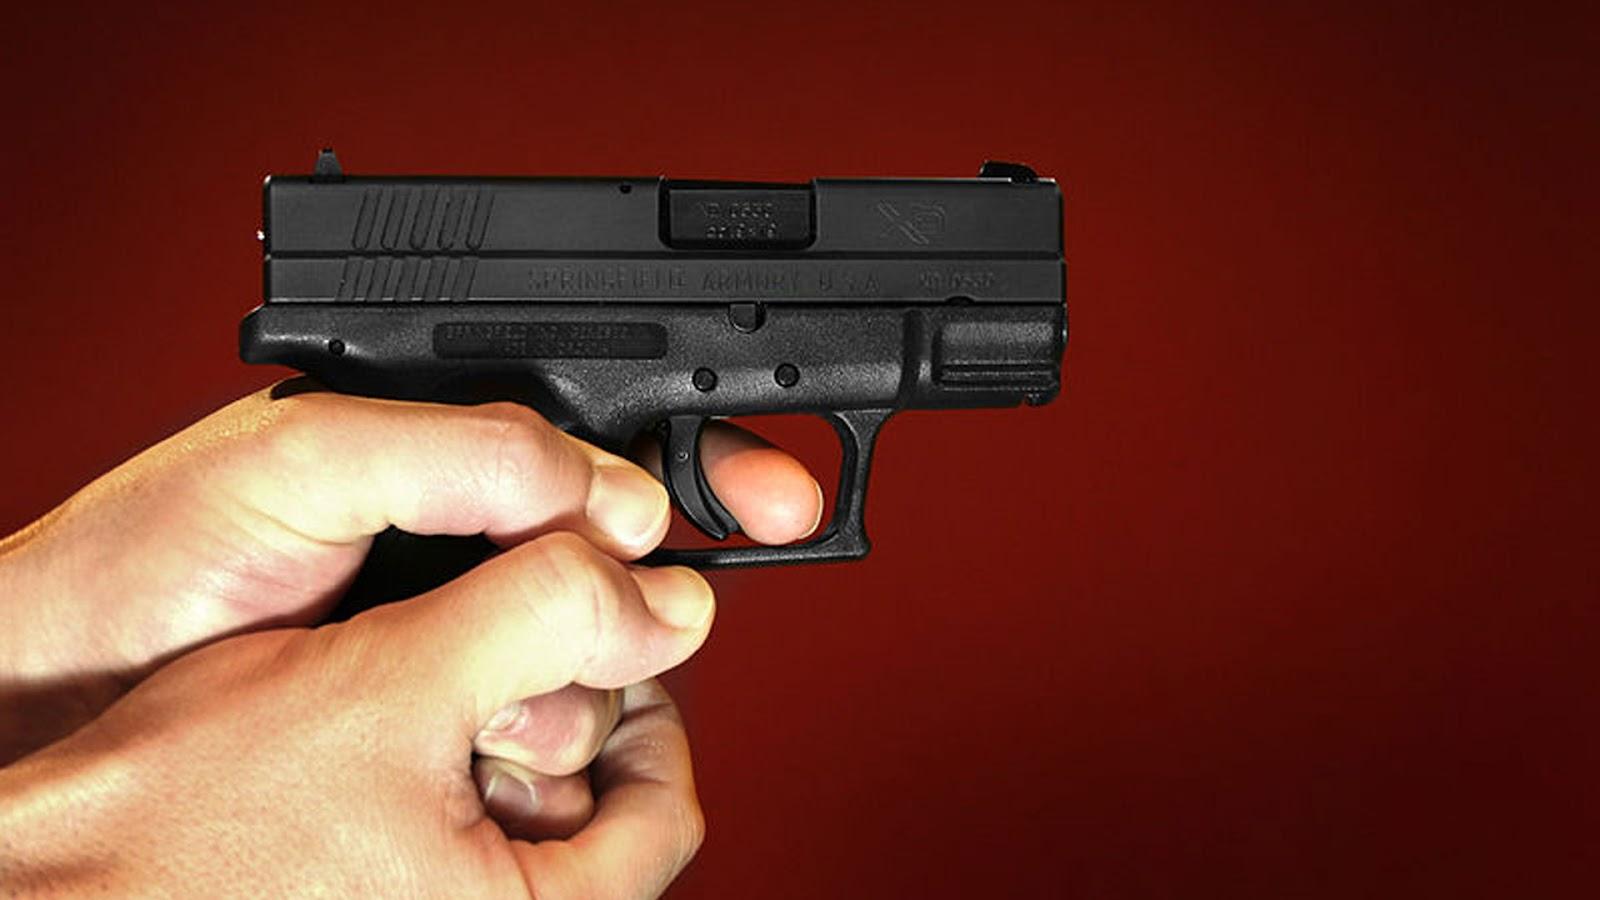 man holding Springfield XD 9mm Handgun with maroon background